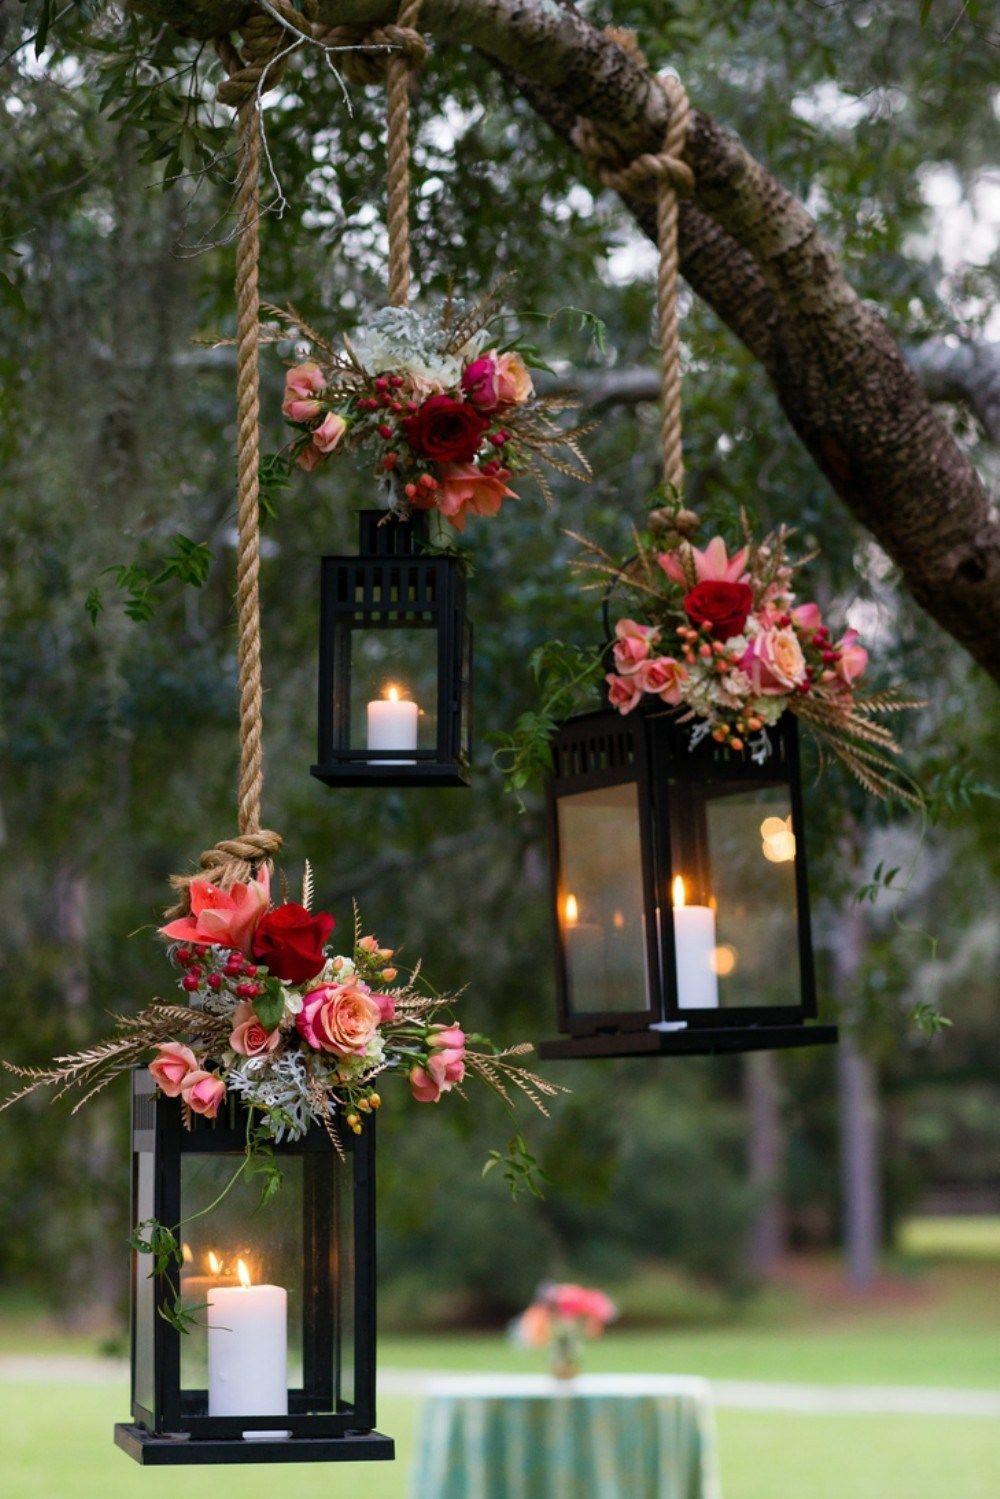 Budget-friendly outdoor wedding ideas for fall (36) | wedding day ...